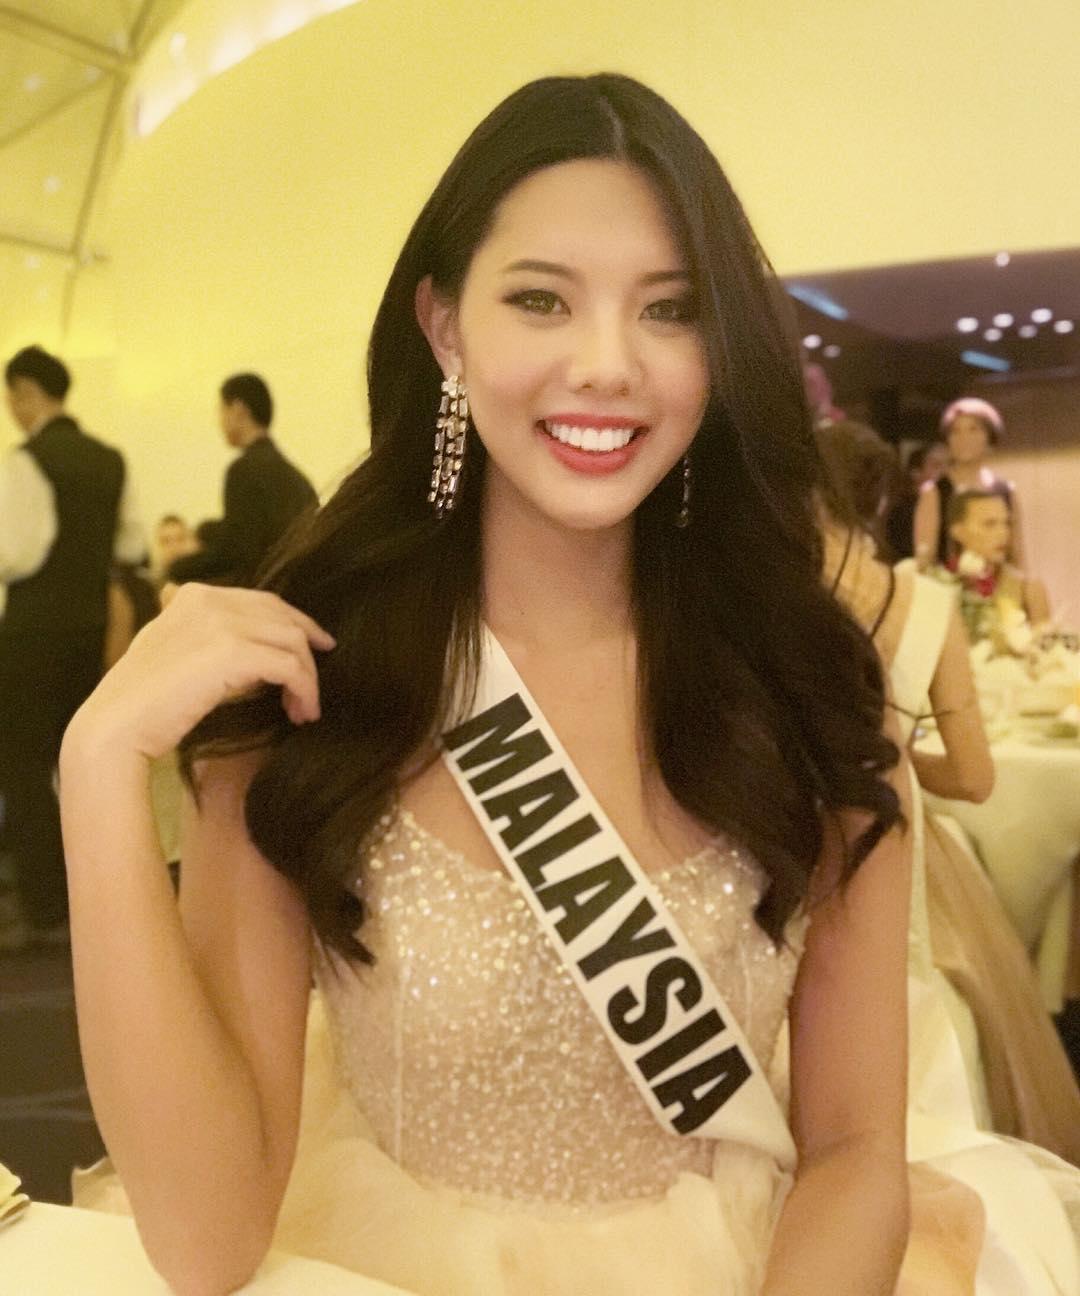 welcome dinner de candidatas a miss universe 2018. - Página 11 Qijntp5v